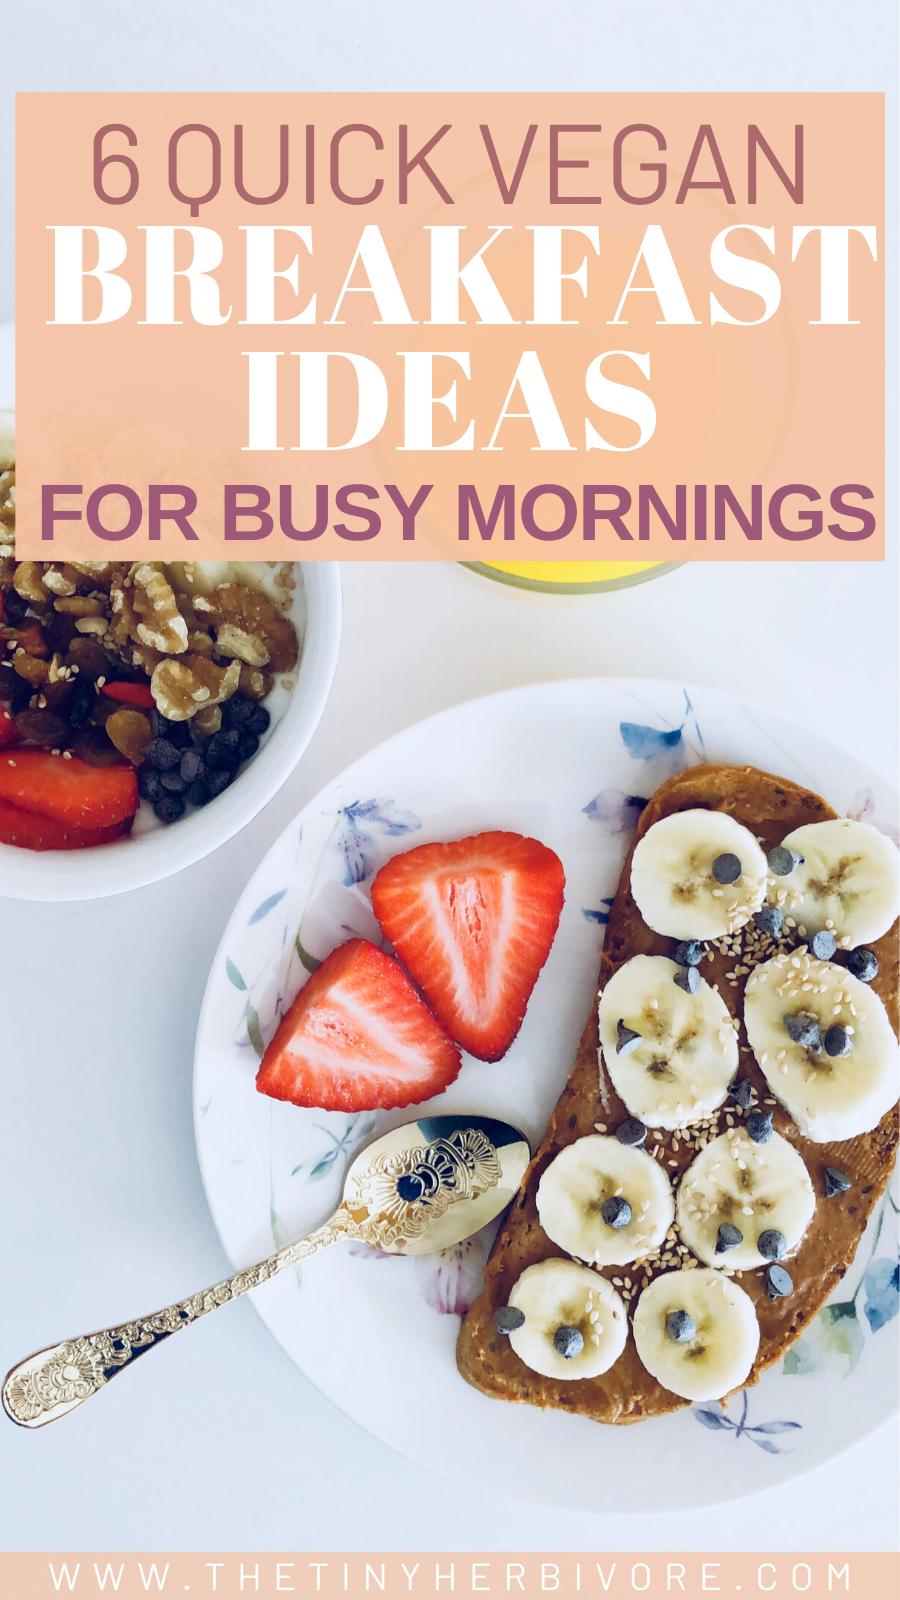 6 Quick Vegan Breakfast Ideas For Busy Mornings The Tiny Herbivore In 2020 Quick Vegan Breakfast Vegan Breakfast Easy Morning Food